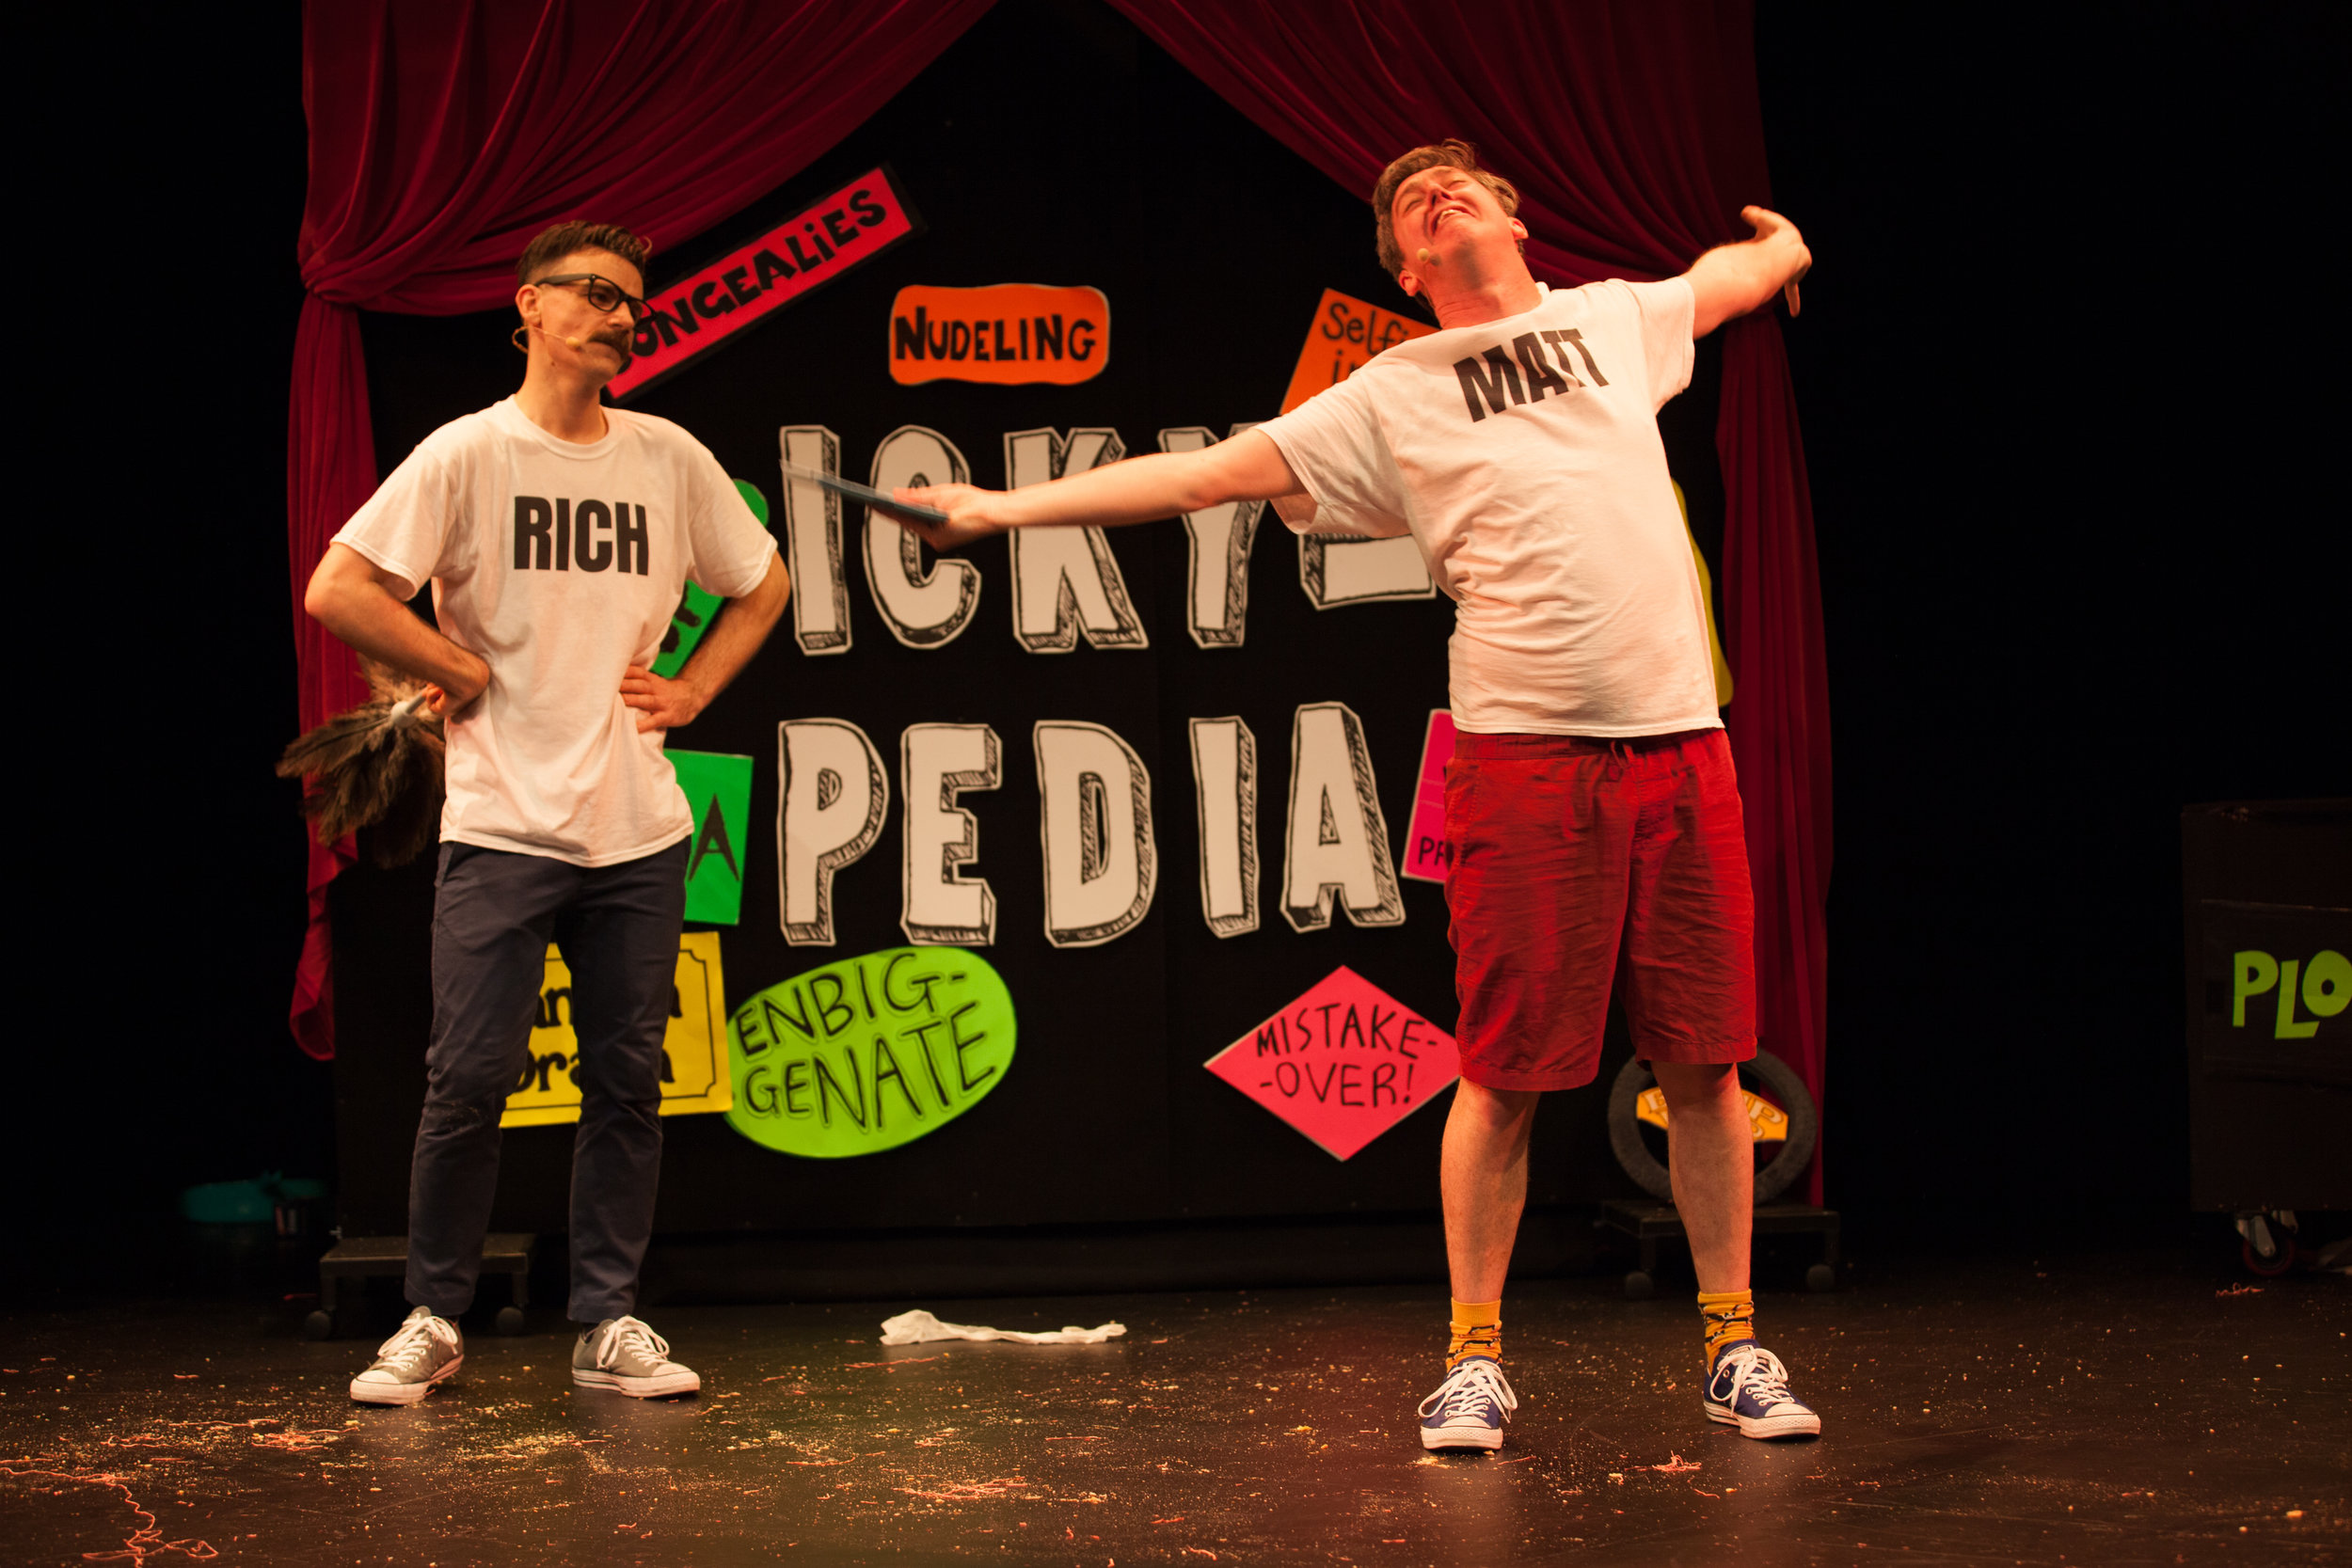 Richard-Higgins-and-Matt-Kelly-The-Listies-Ickypedia-Performance-Image-Photo-by-Pier-Carthew.jpg